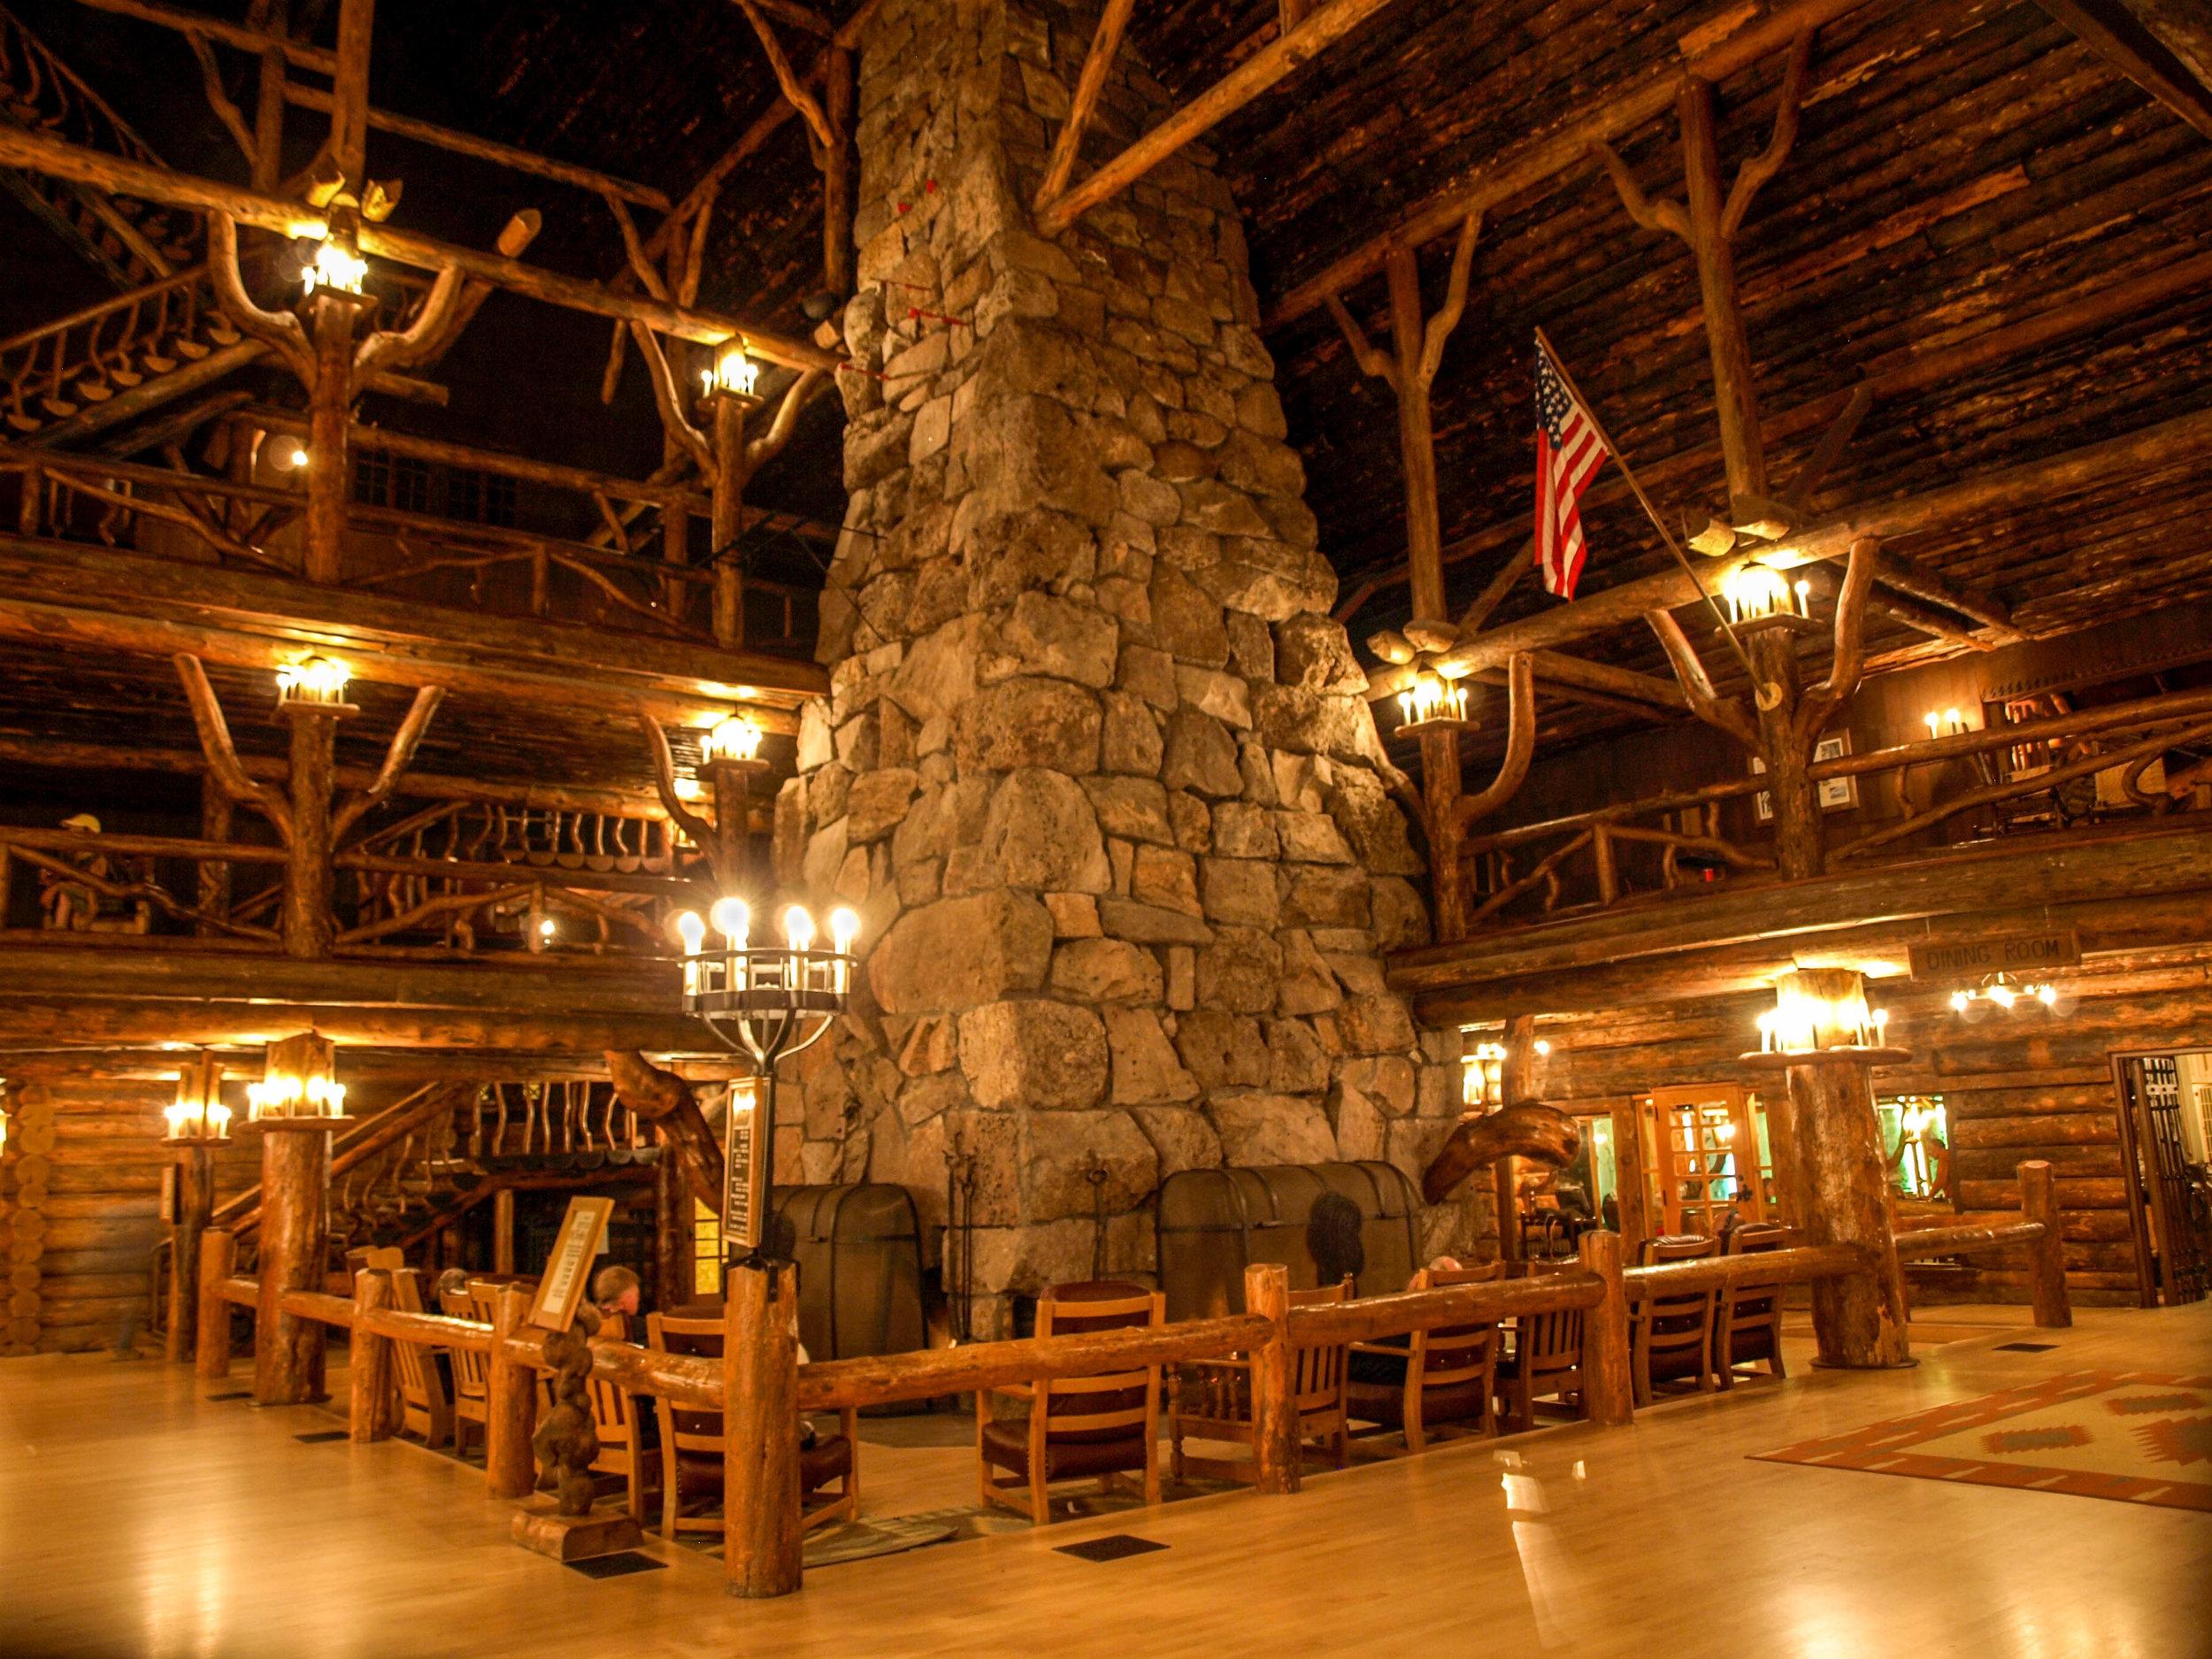 The Fireplace at Old Faithful Inn